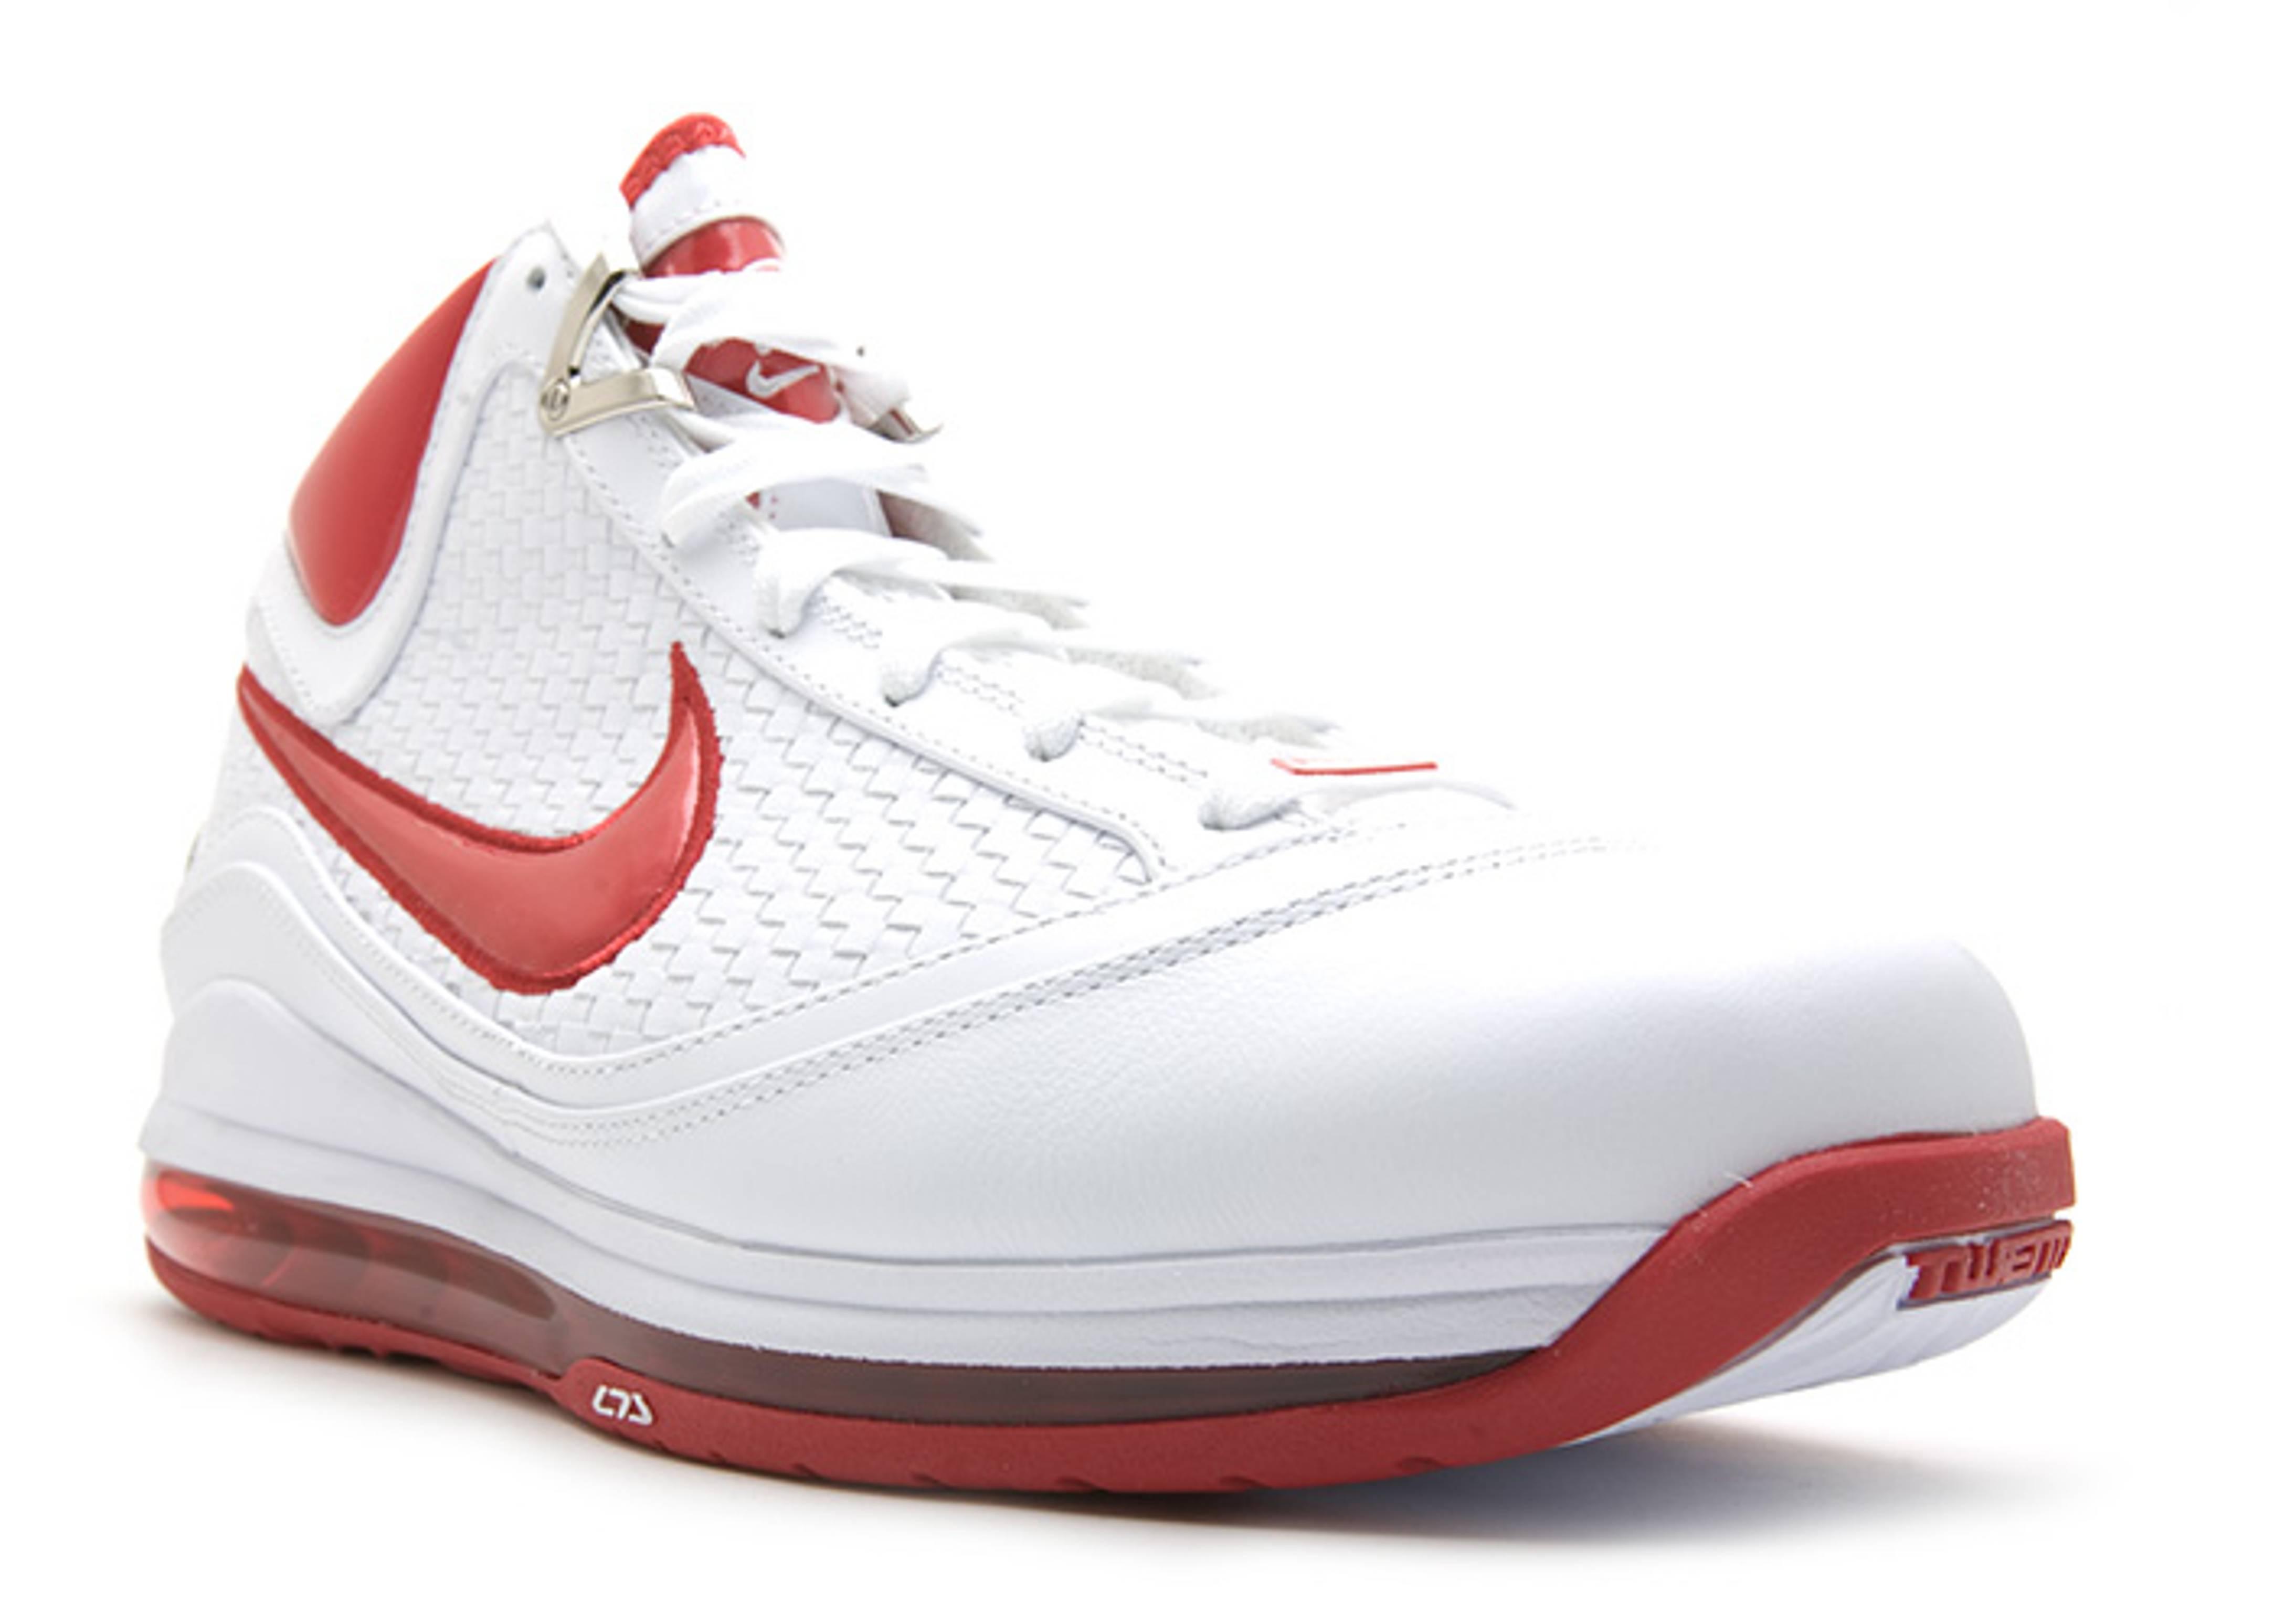 Air Max Lebron 7 Nfw - Nike - 383578 161 - white/varsity red | Flight Club